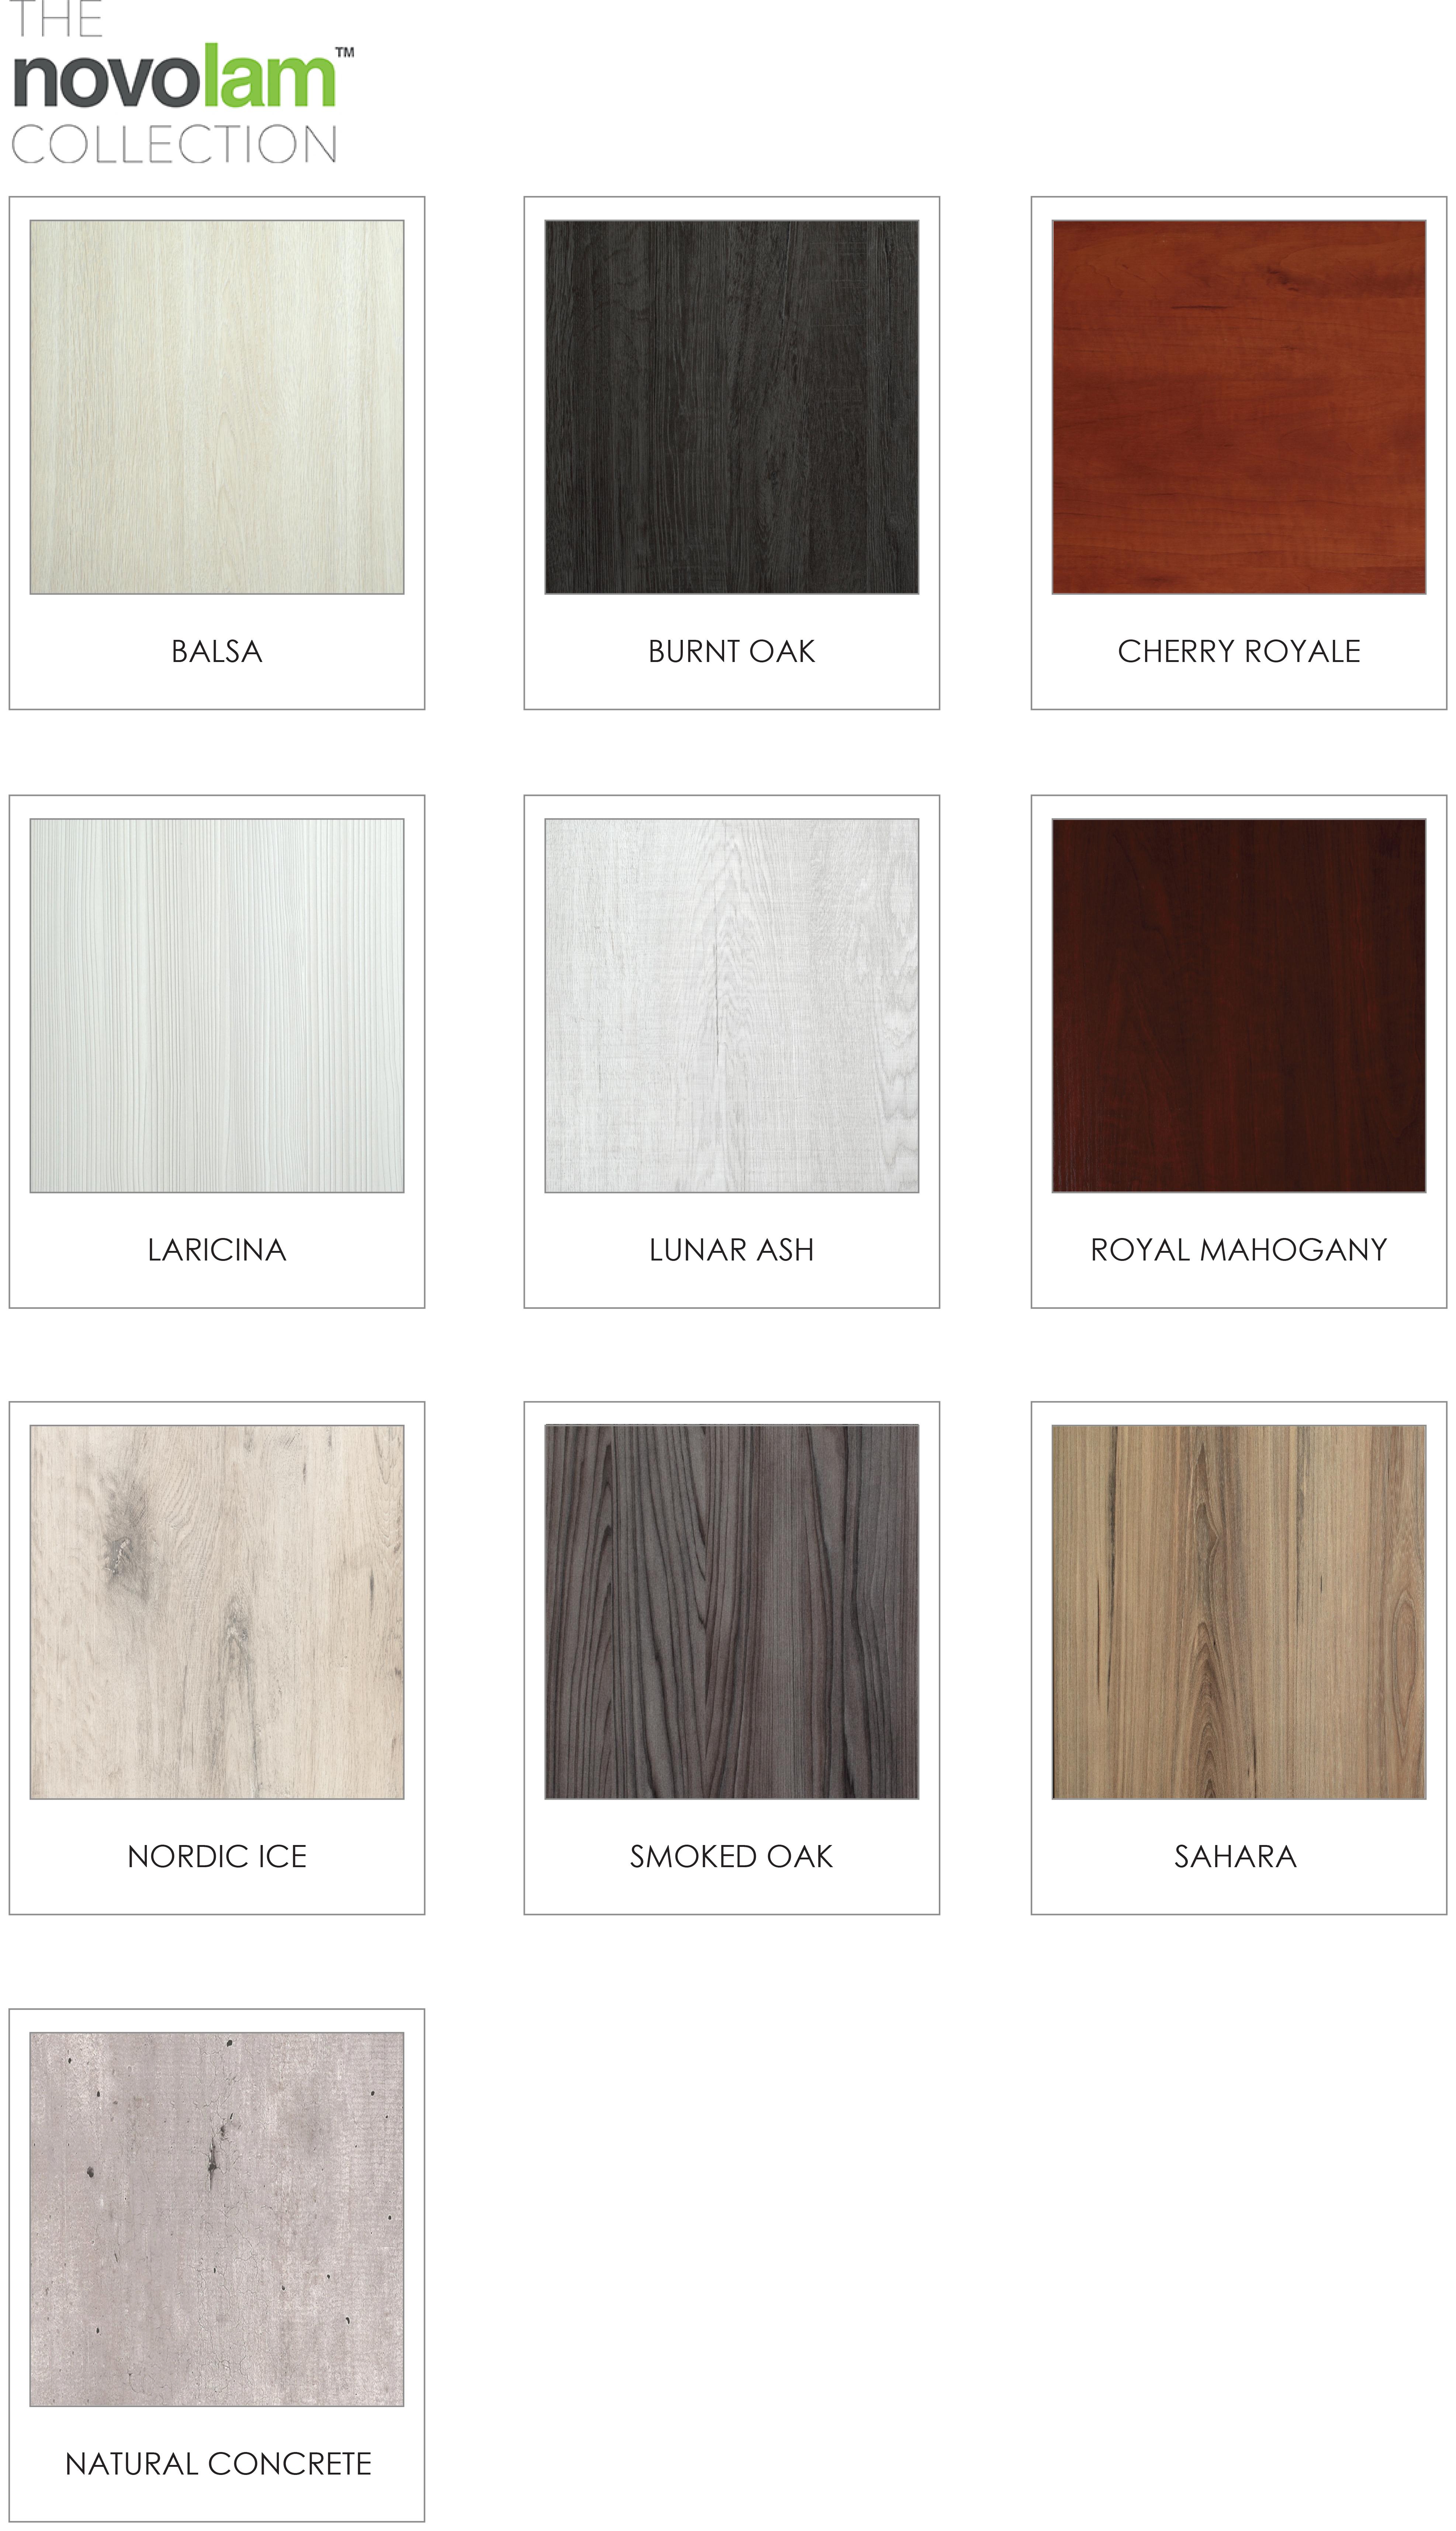 Novolam Lansdowne Boards